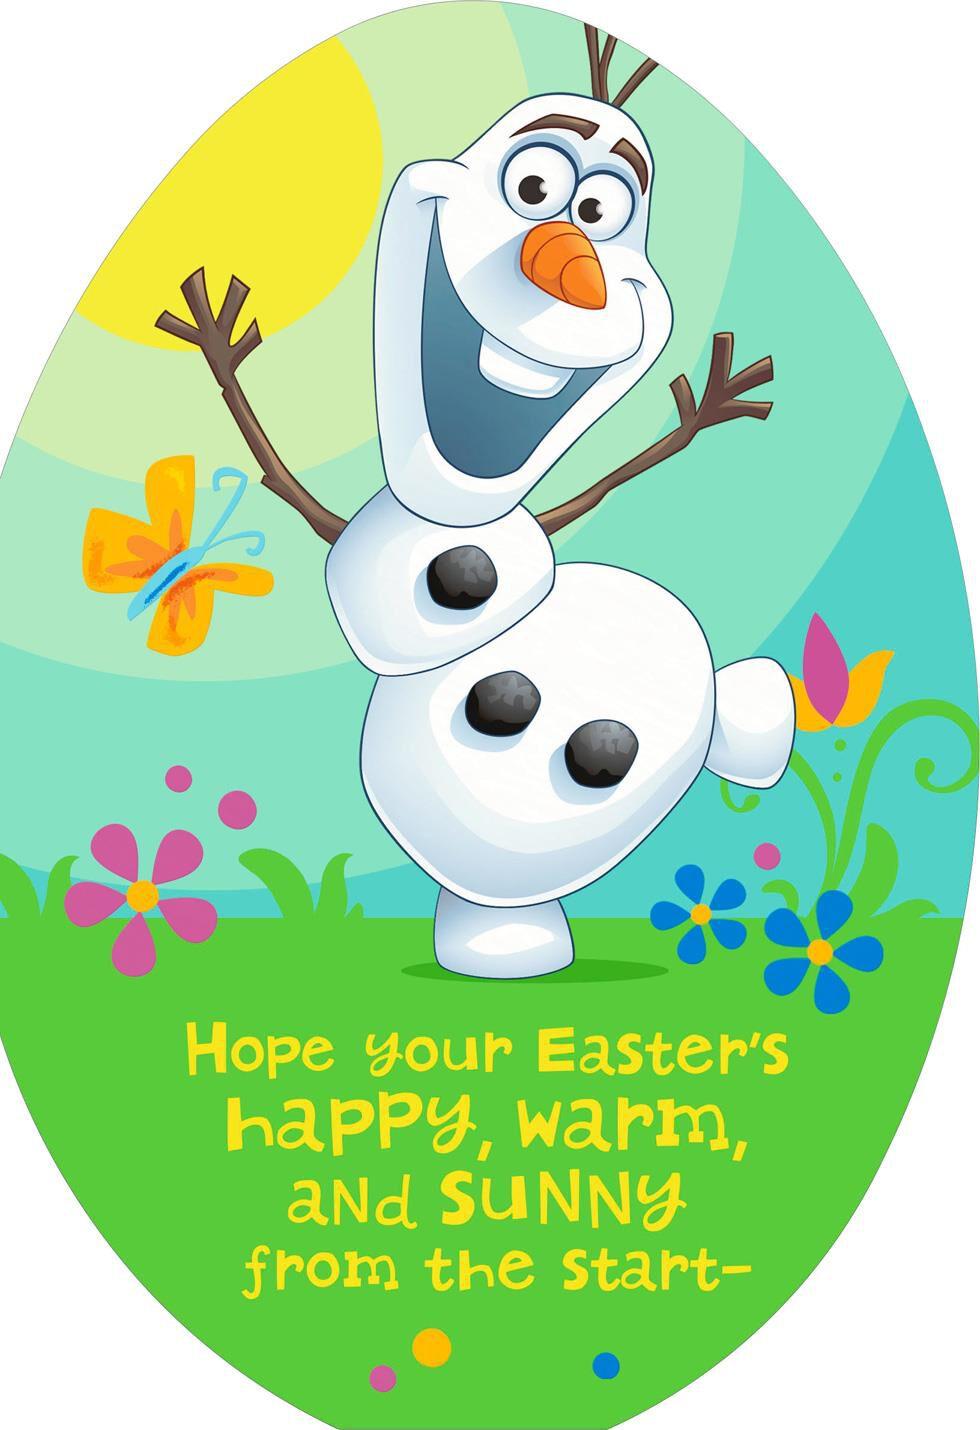 Frozen Olaf Easter Card for Kid Greeting Cards Hallmark – Hallmark Easter Cards